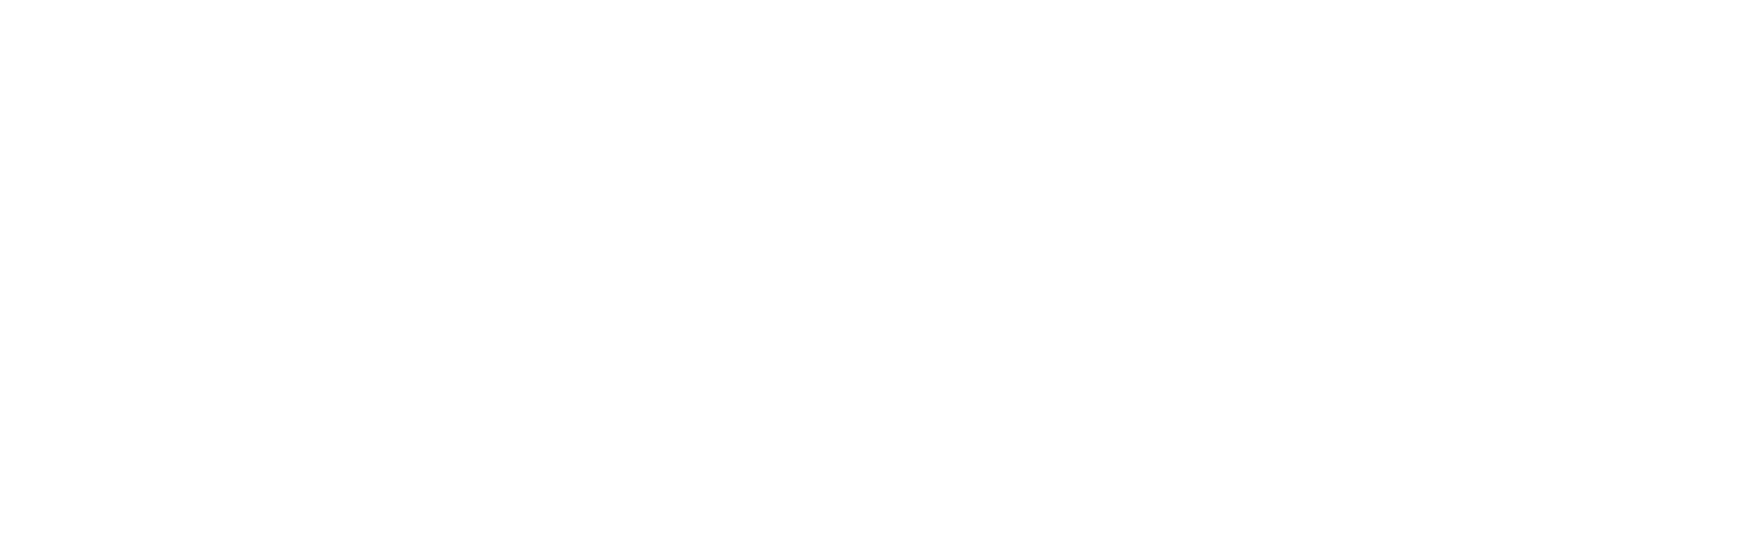 dwellTEK logo white